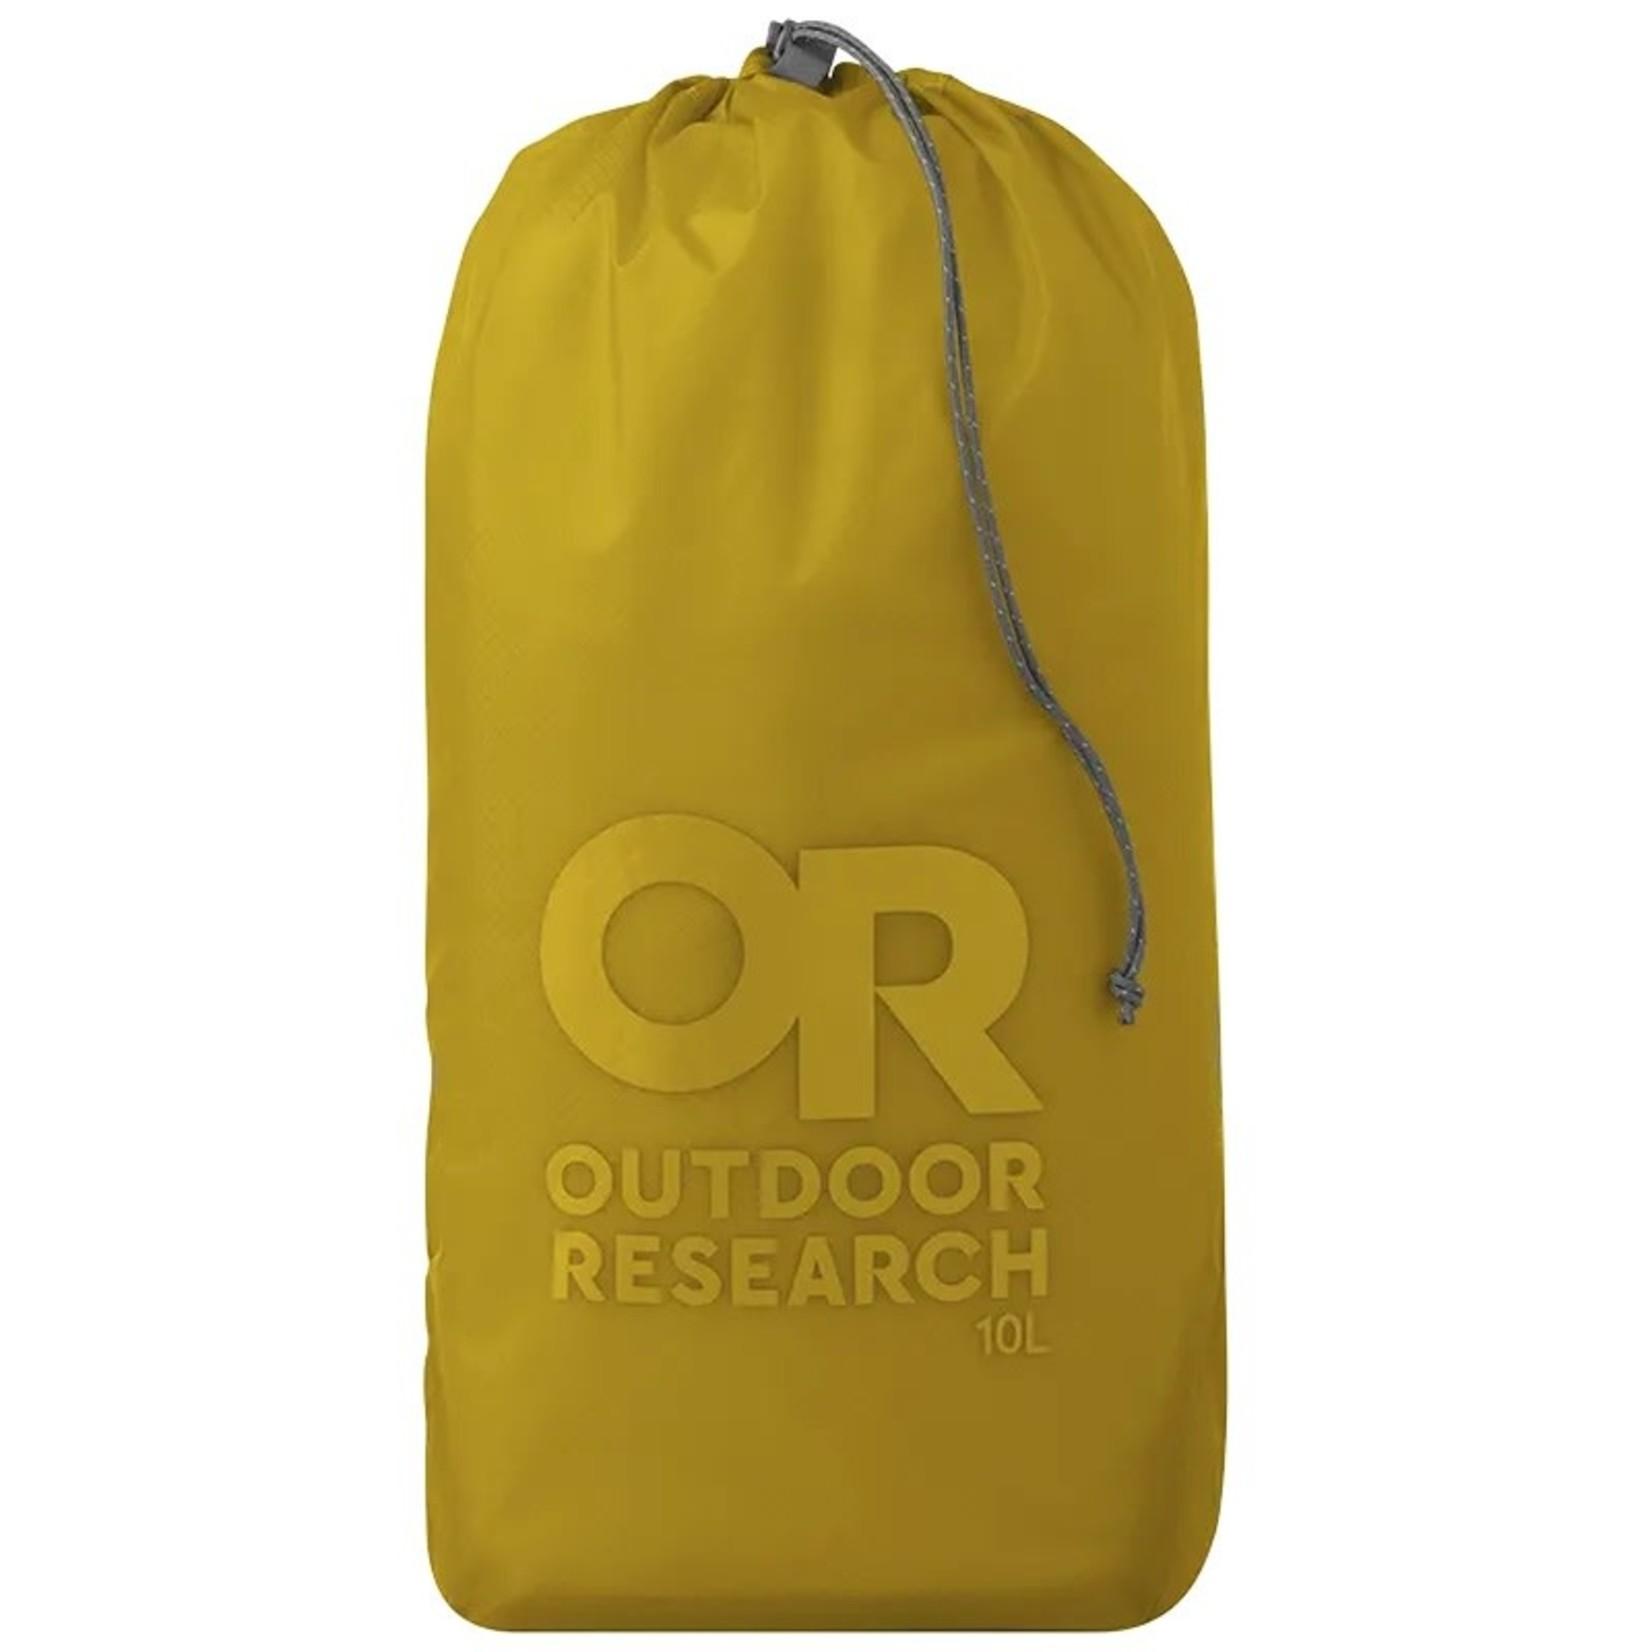 Outdoor Research Sac de rangement Outdoor Research Ultralight - 10L